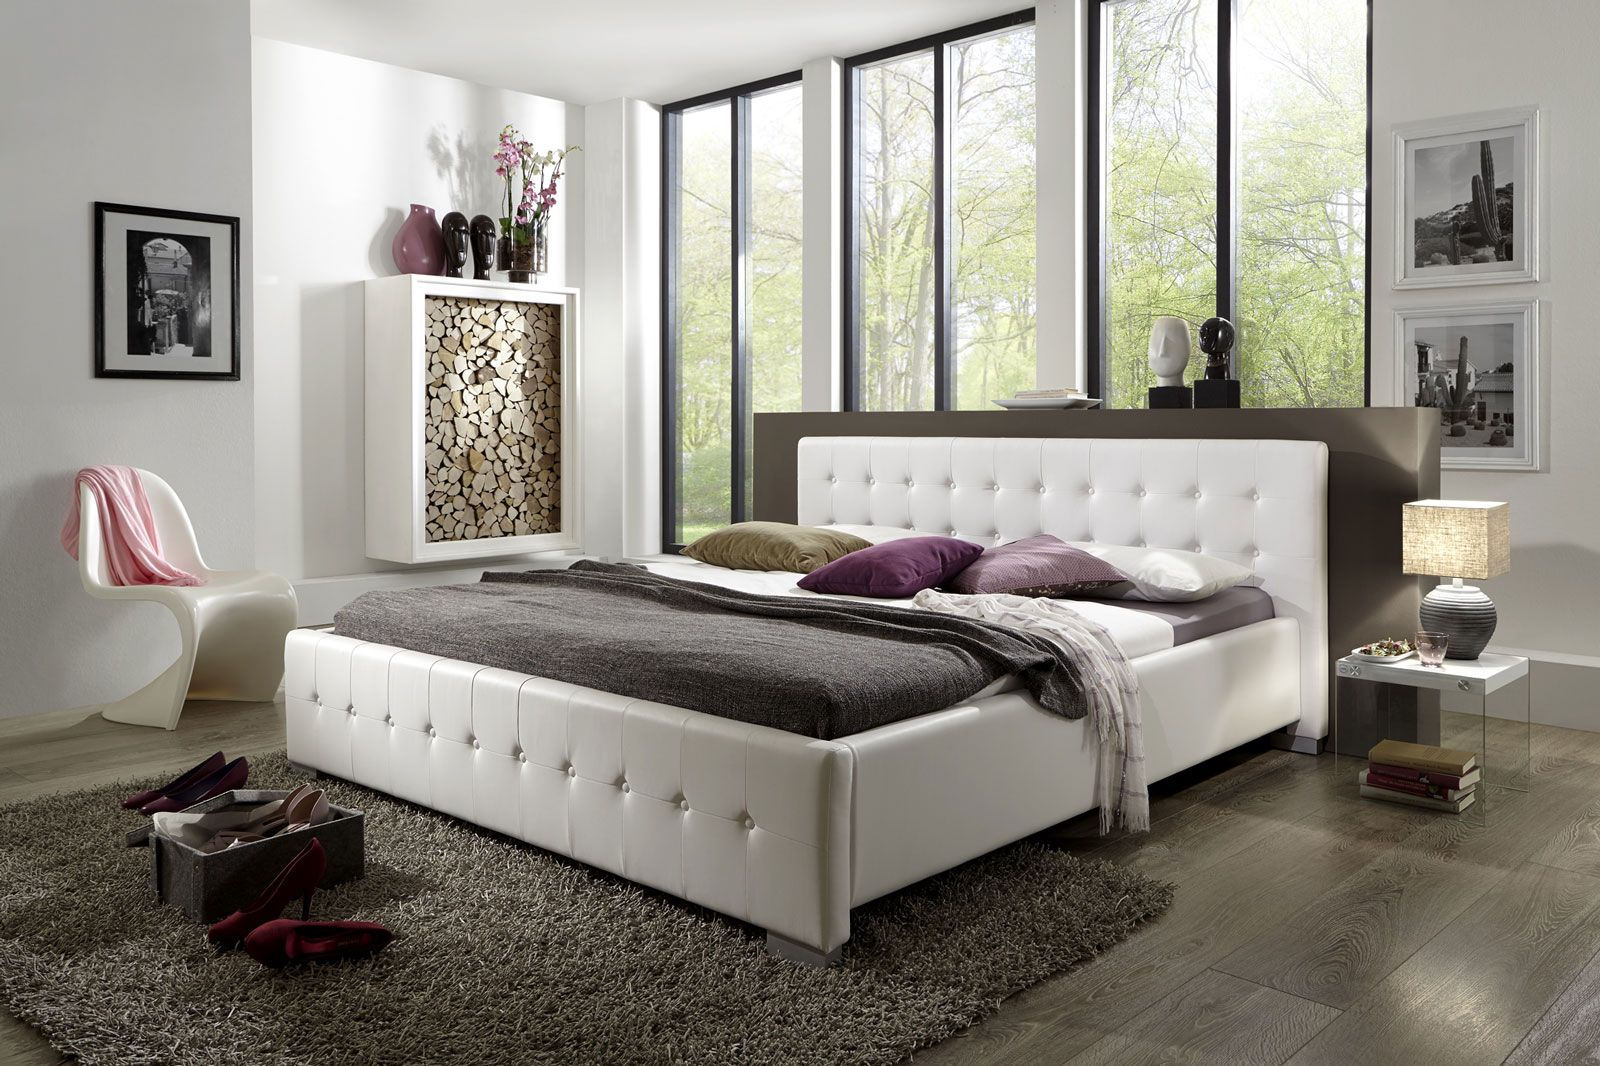 SAM® Polsterbett 180 x 200 cm weiß Haus deko, Bett